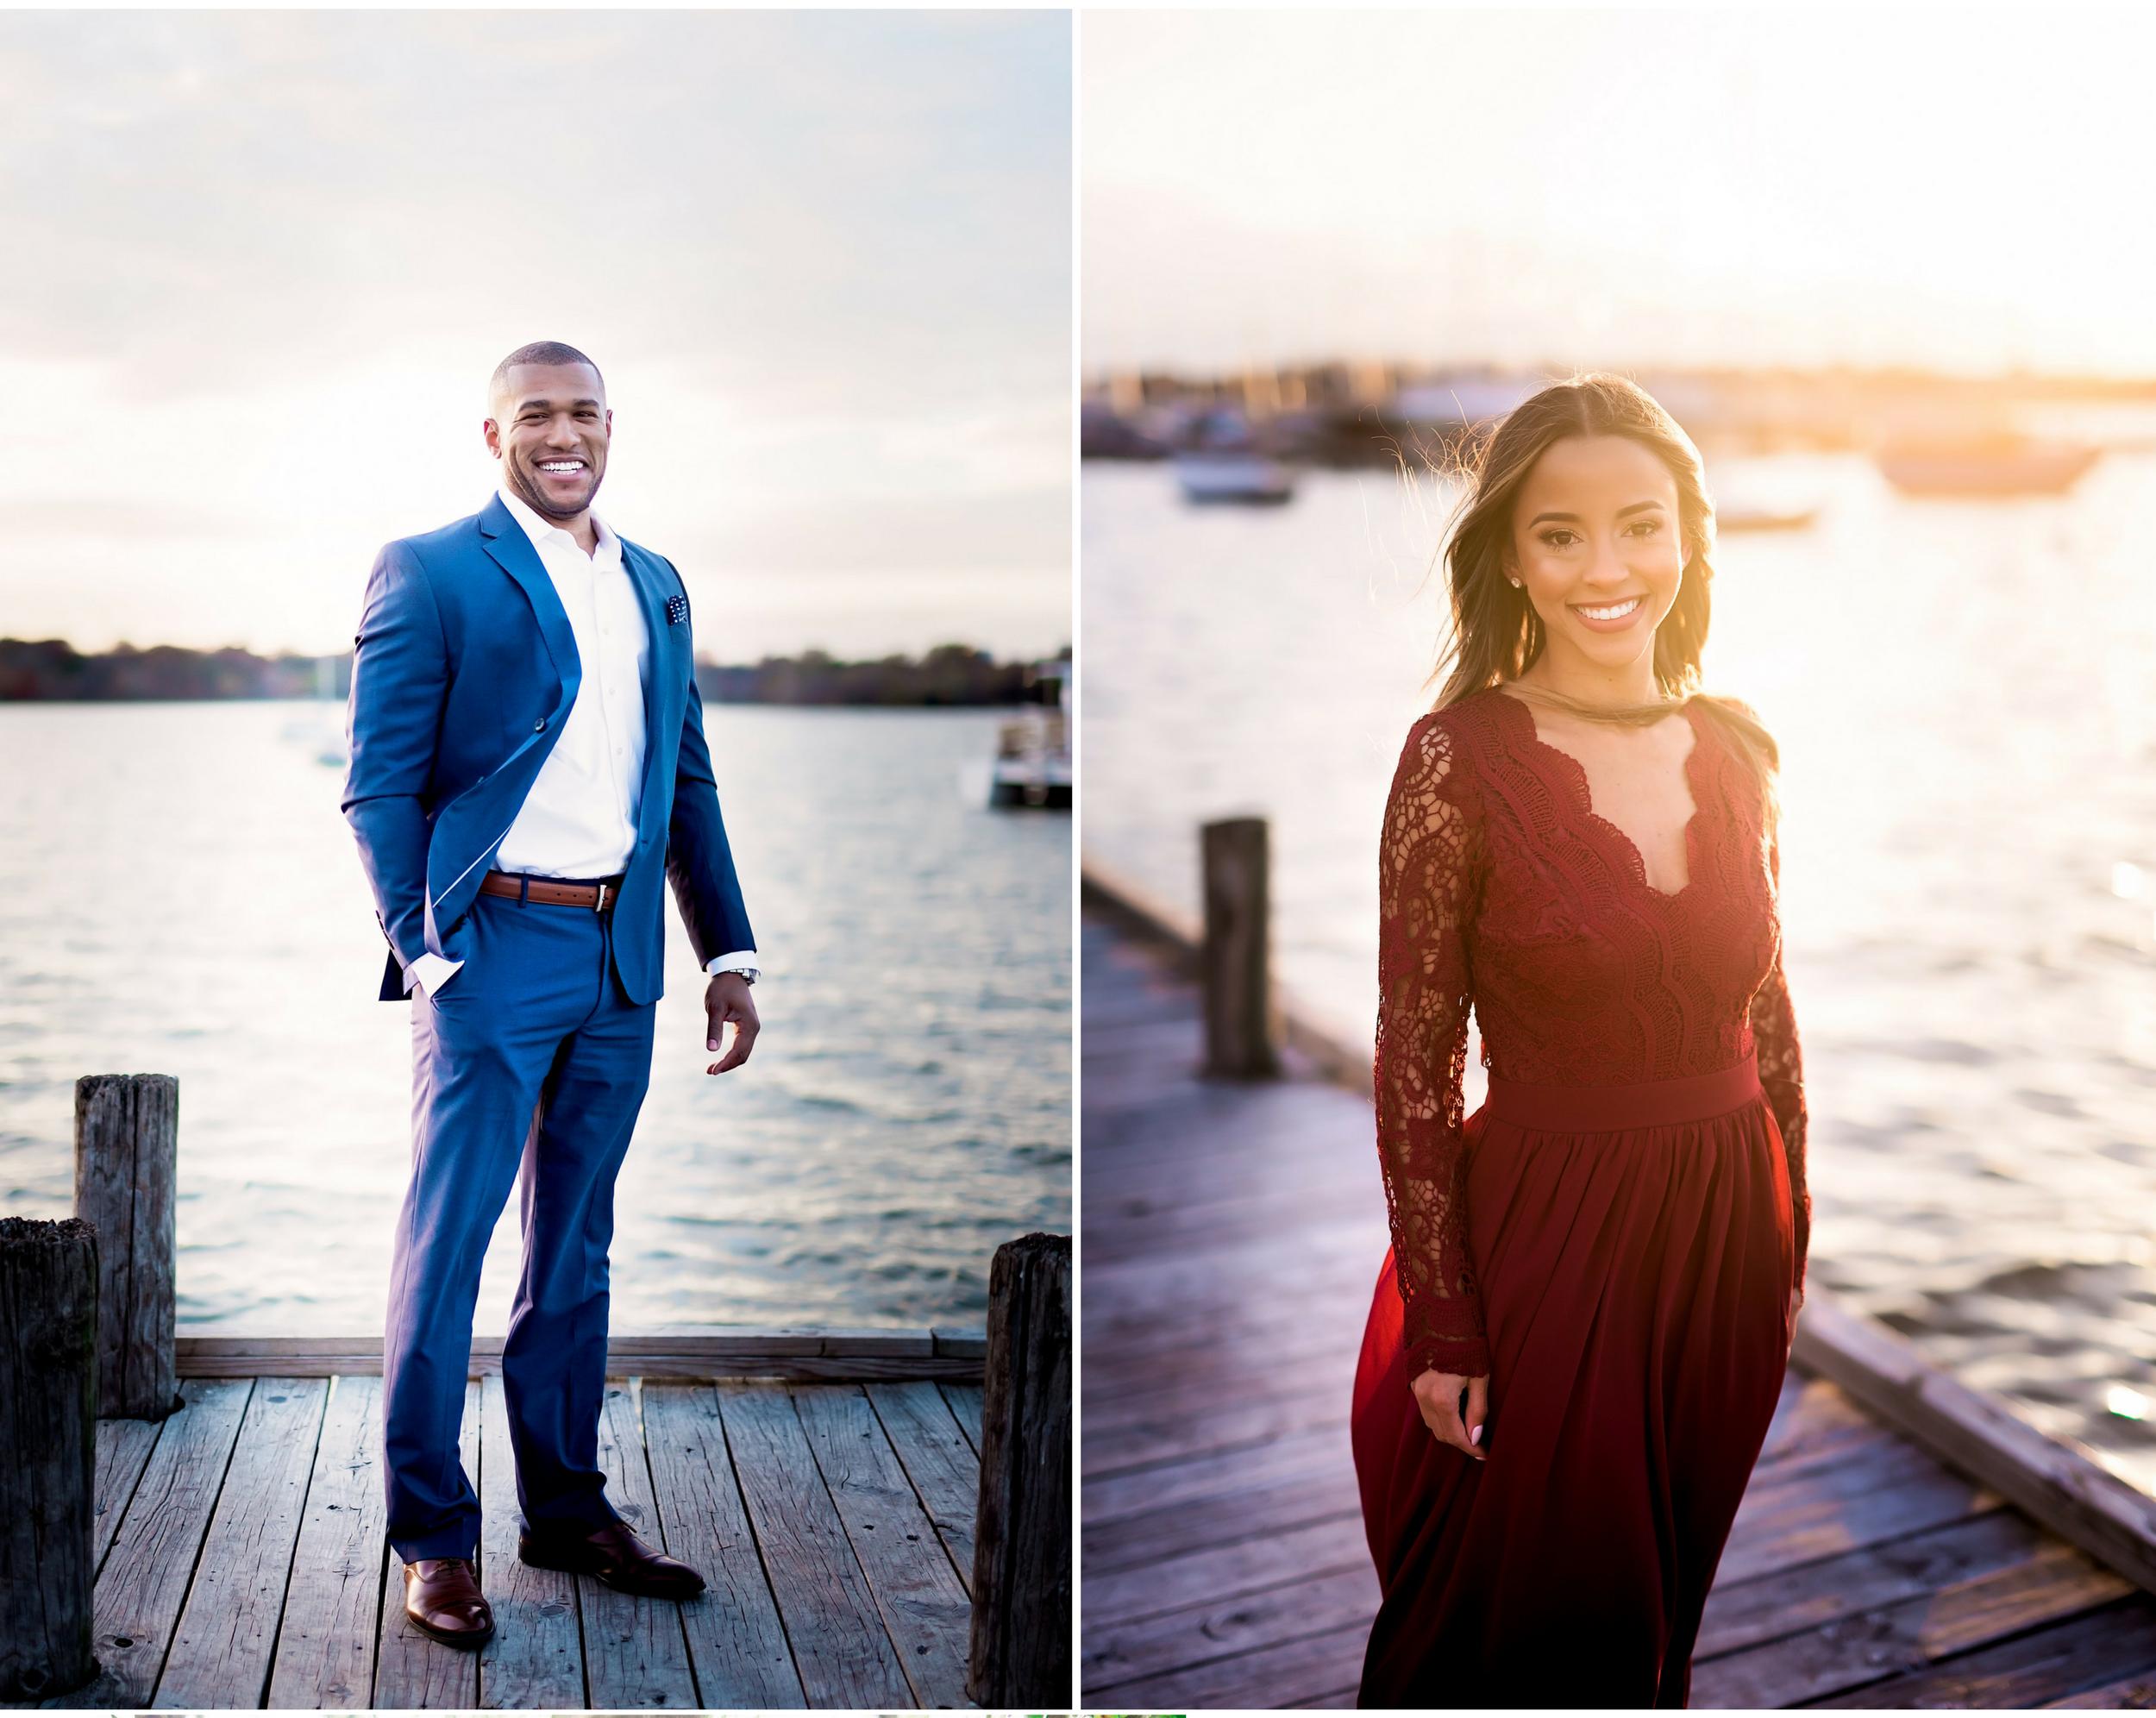 Texas Engagement- Engagement Session- Pharris Photography- Wedding Photography- Noelle and Sullivan